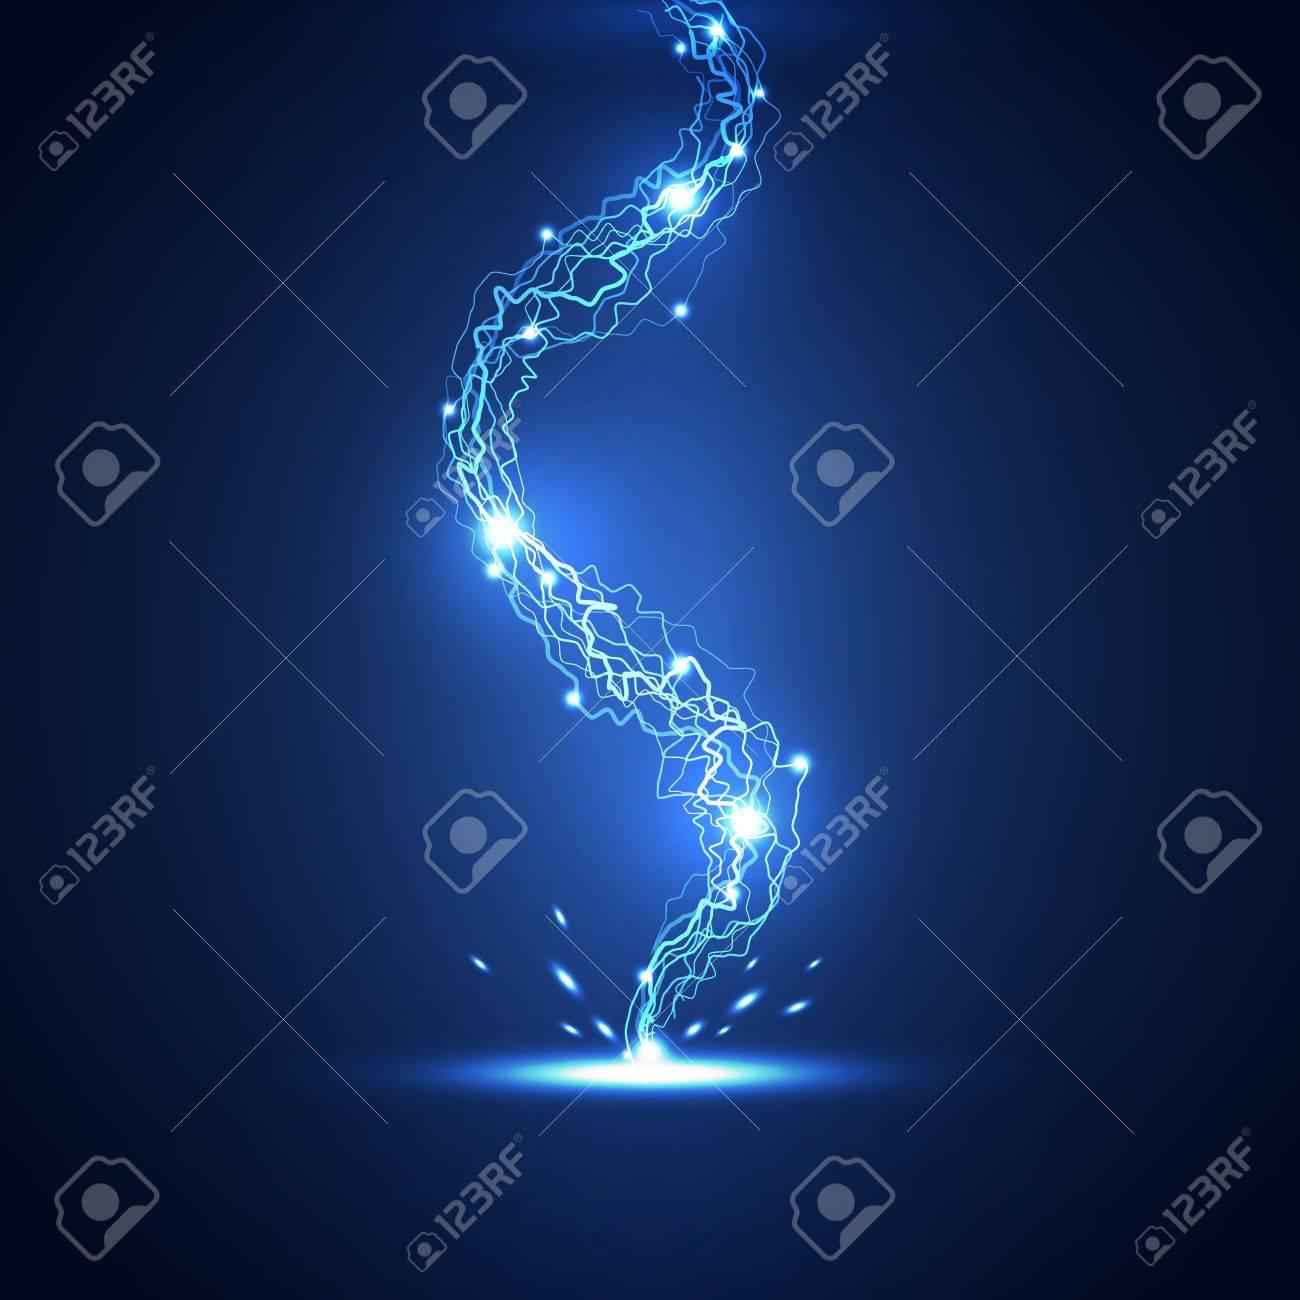 Abstract lightning technology background, vector illustration - 33887712